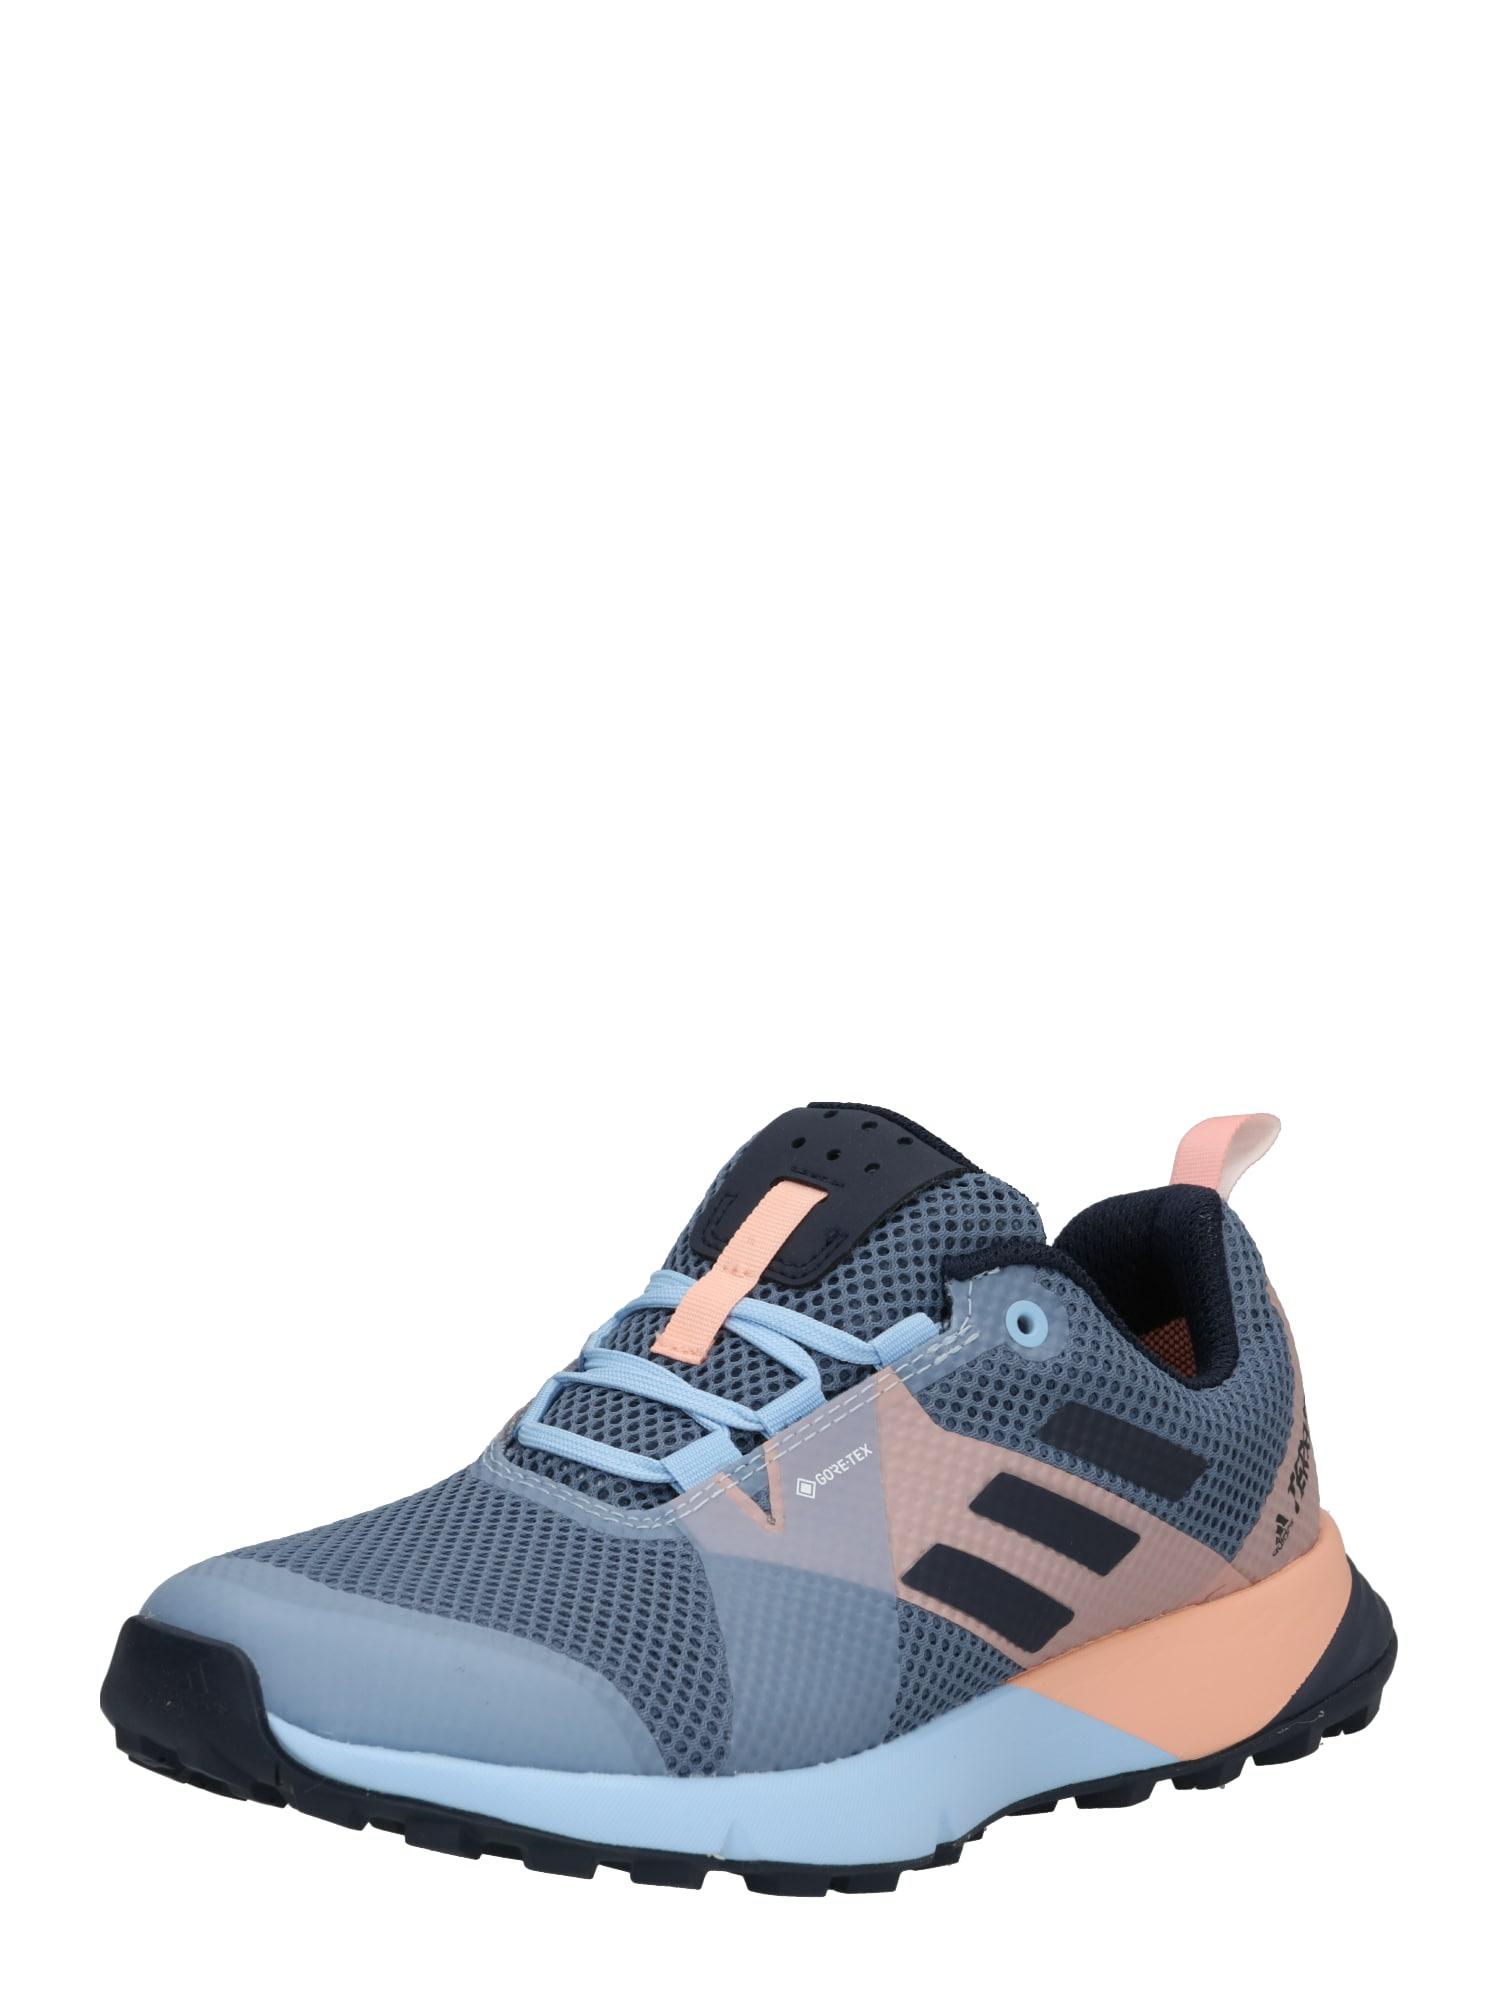 Běžecká obuv TERREX TWO GTX W kouřově modrá růžová ADIDAS PERFORMANCE